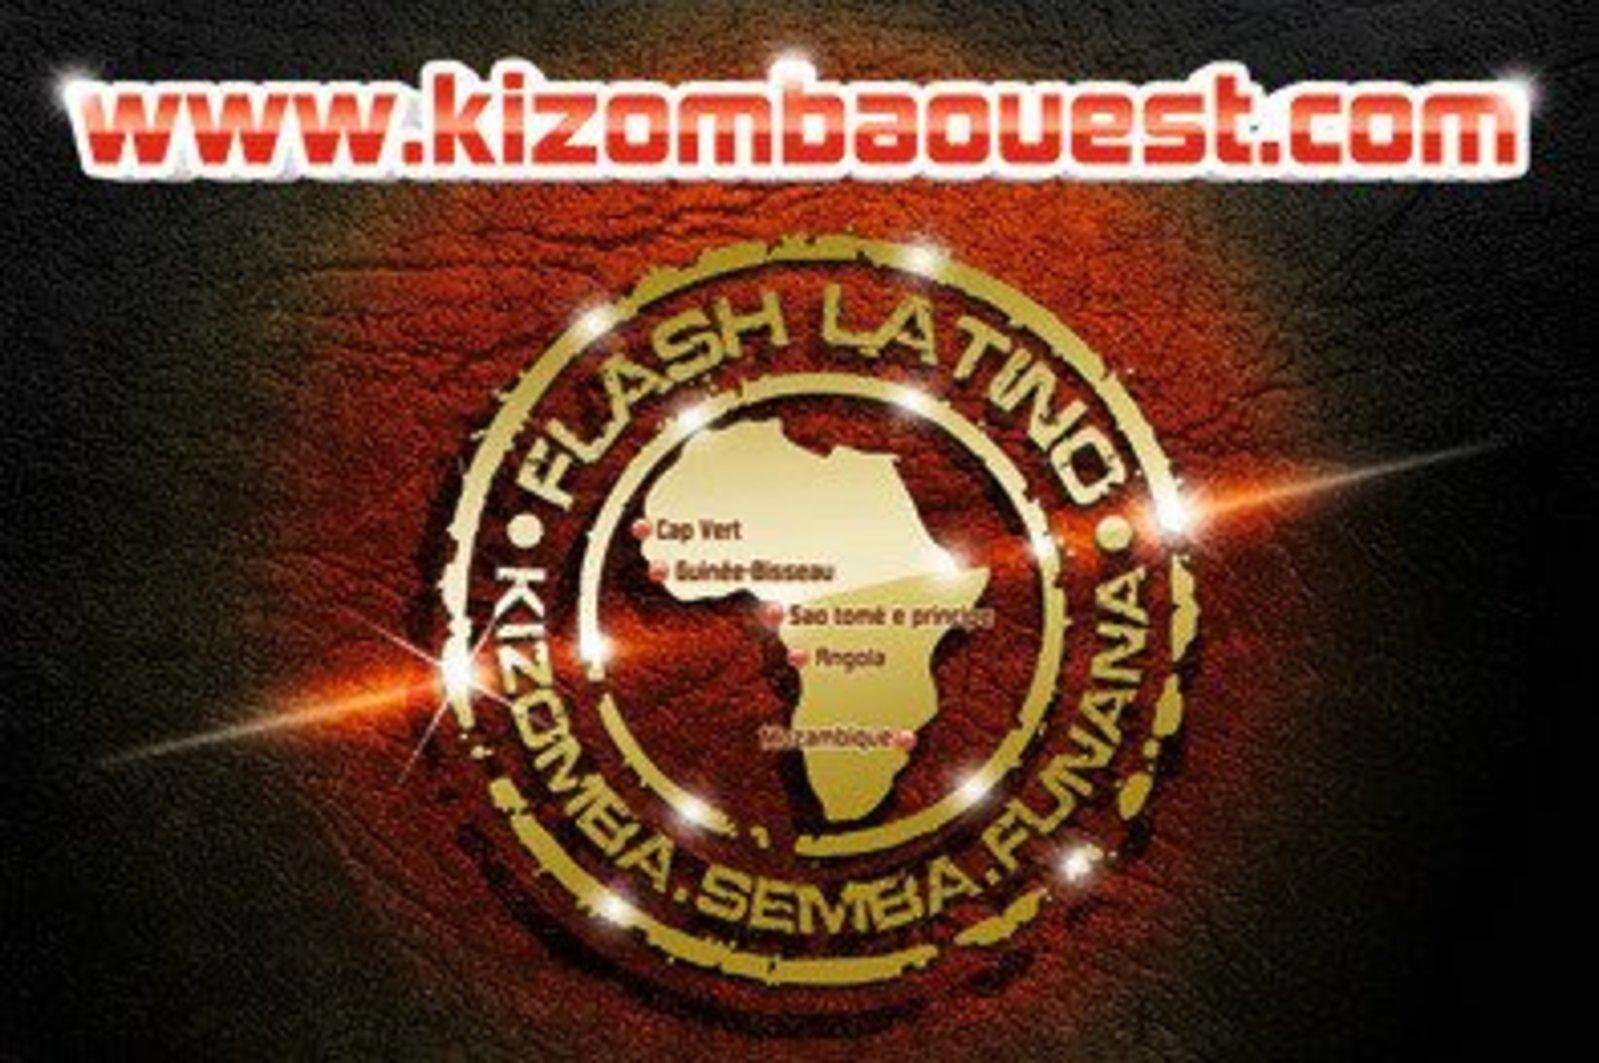 COURS DE KIZOMBA/SEMBA SAINT-BREVIN SAISON 2015/2016 - ASSOCIATION KIZOMBA OUEST